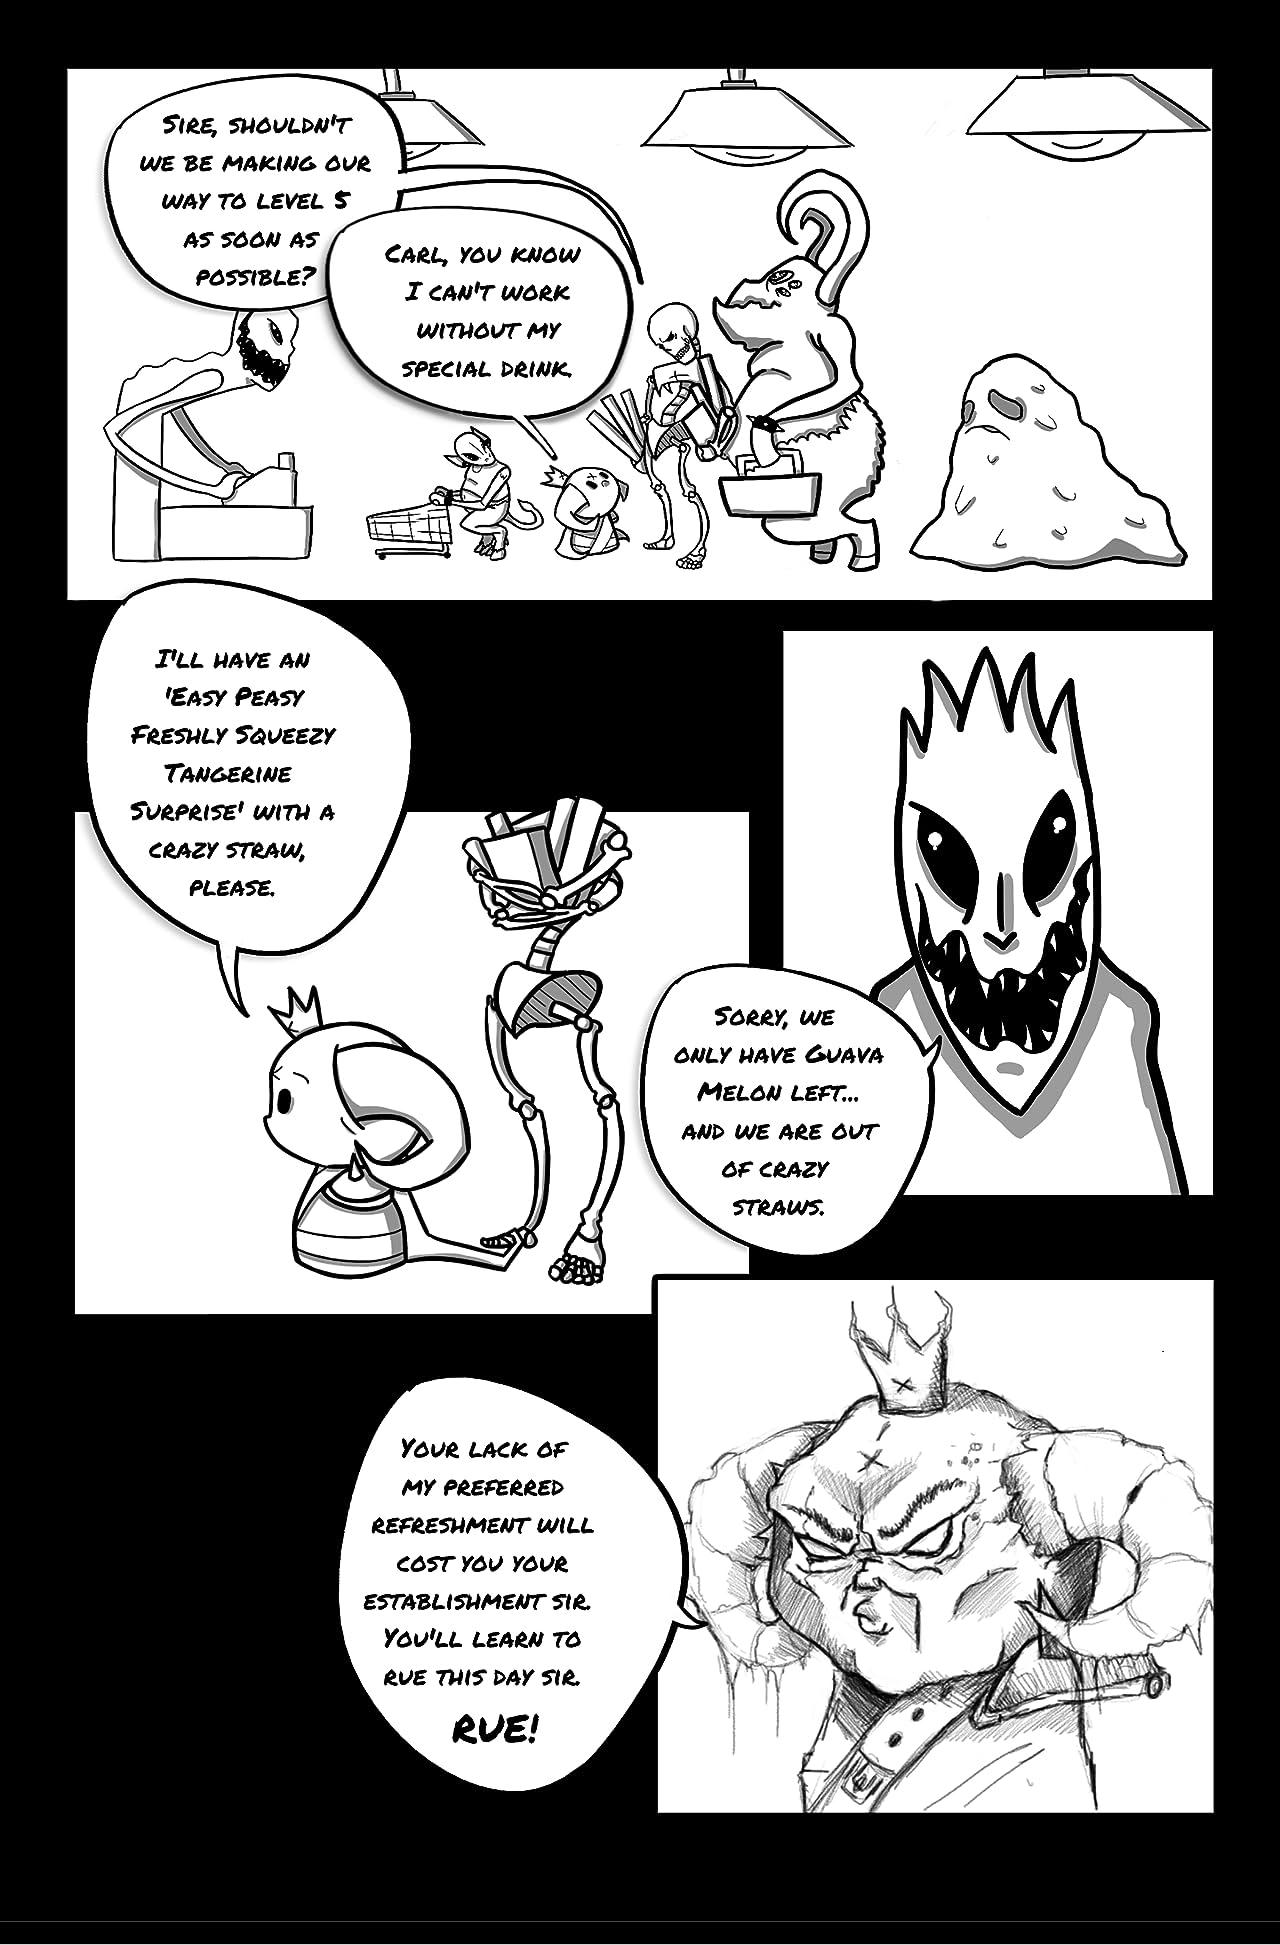 Prints Of The Underworld #1